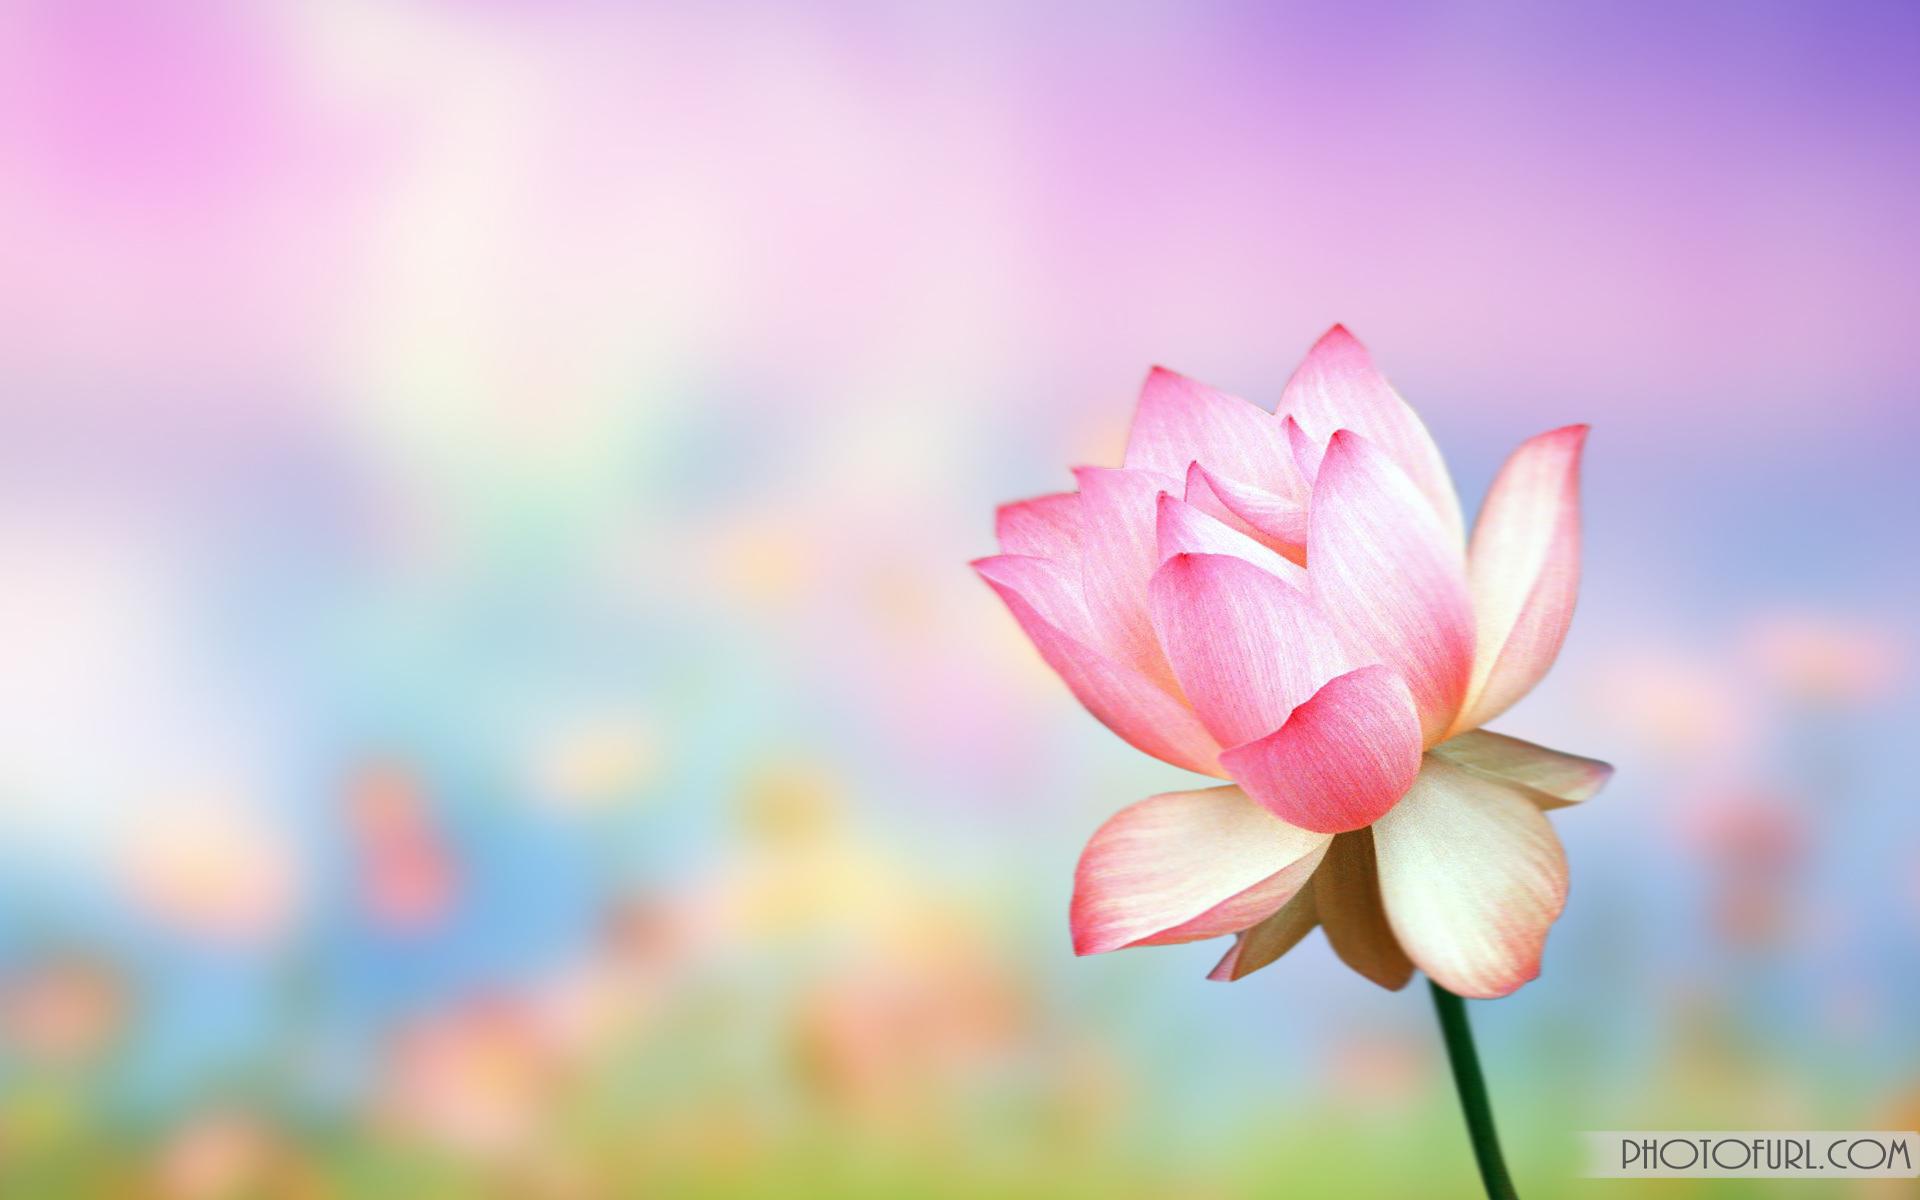 Background Images Flowers - WallpaperSafari